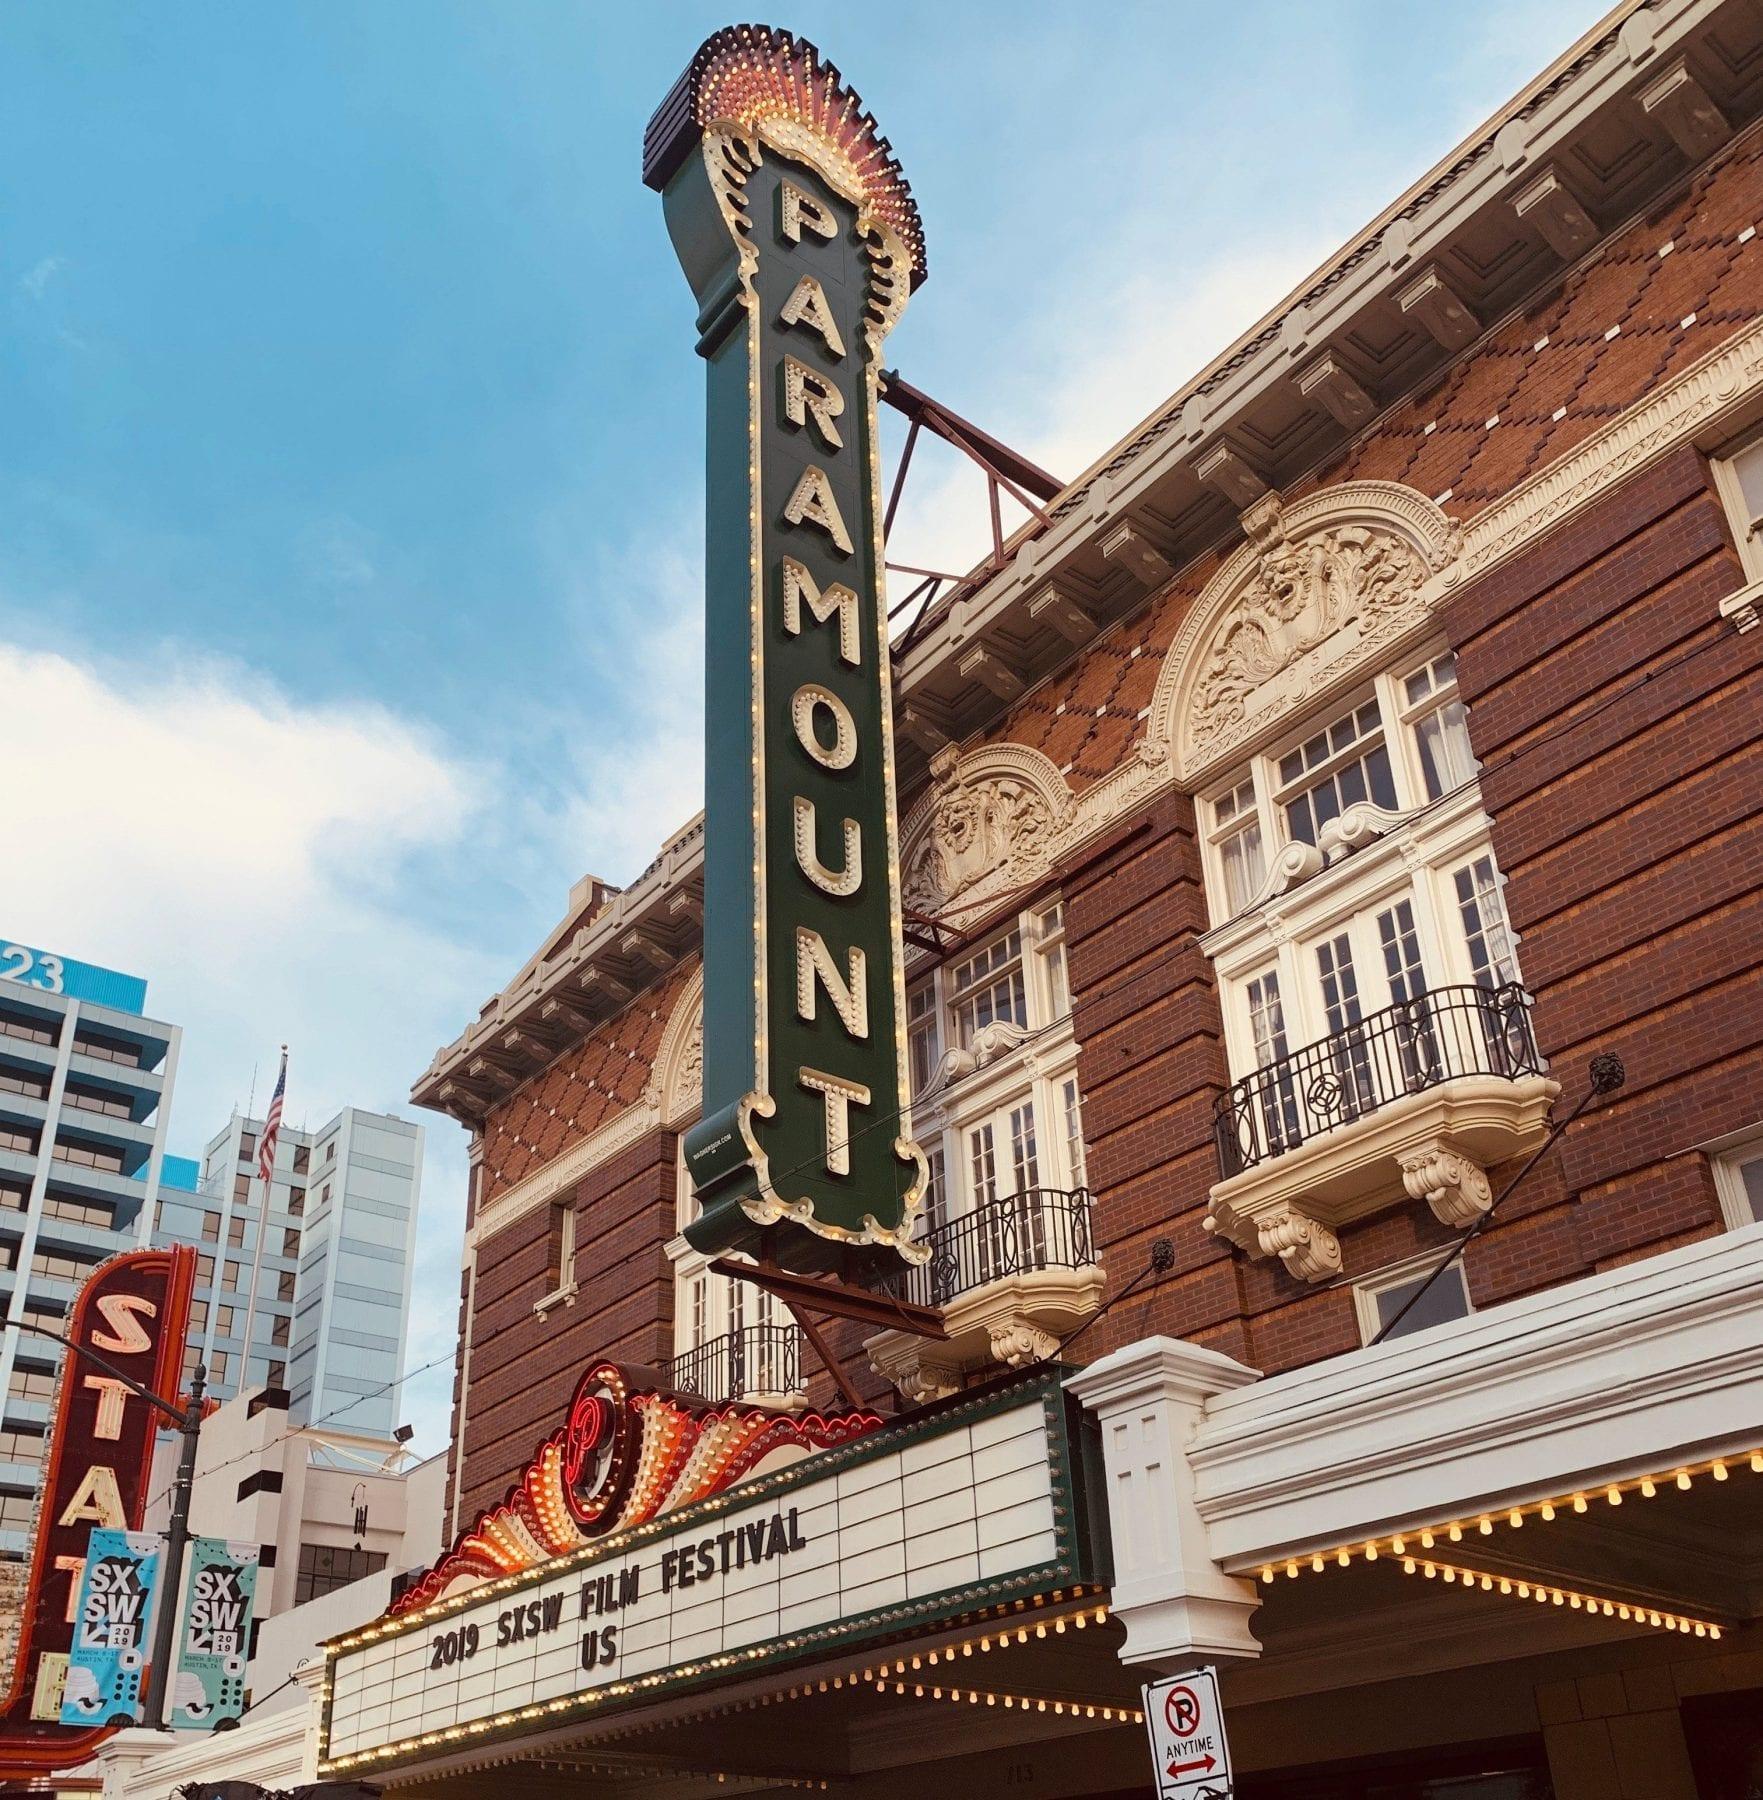 The film US premieres at 2019's SXSW.